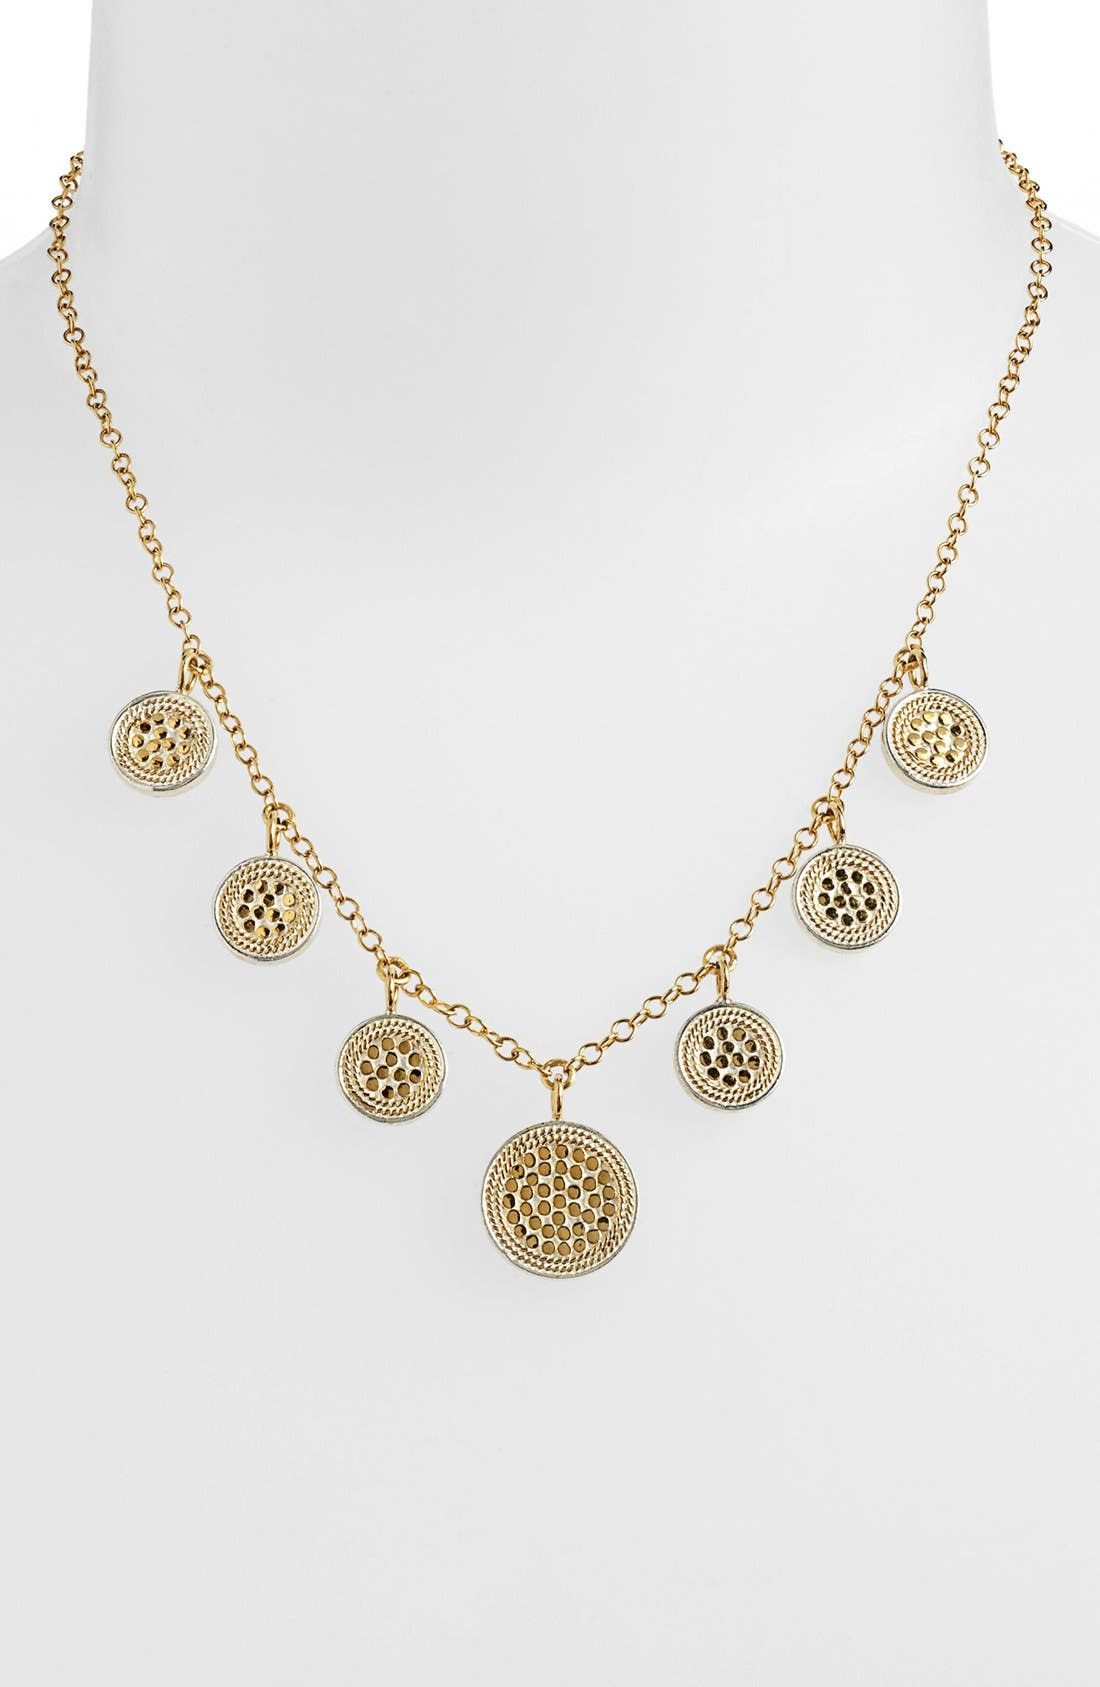 Main Image - Anna Beck 'Gili' 7-Disc Charm Necklace